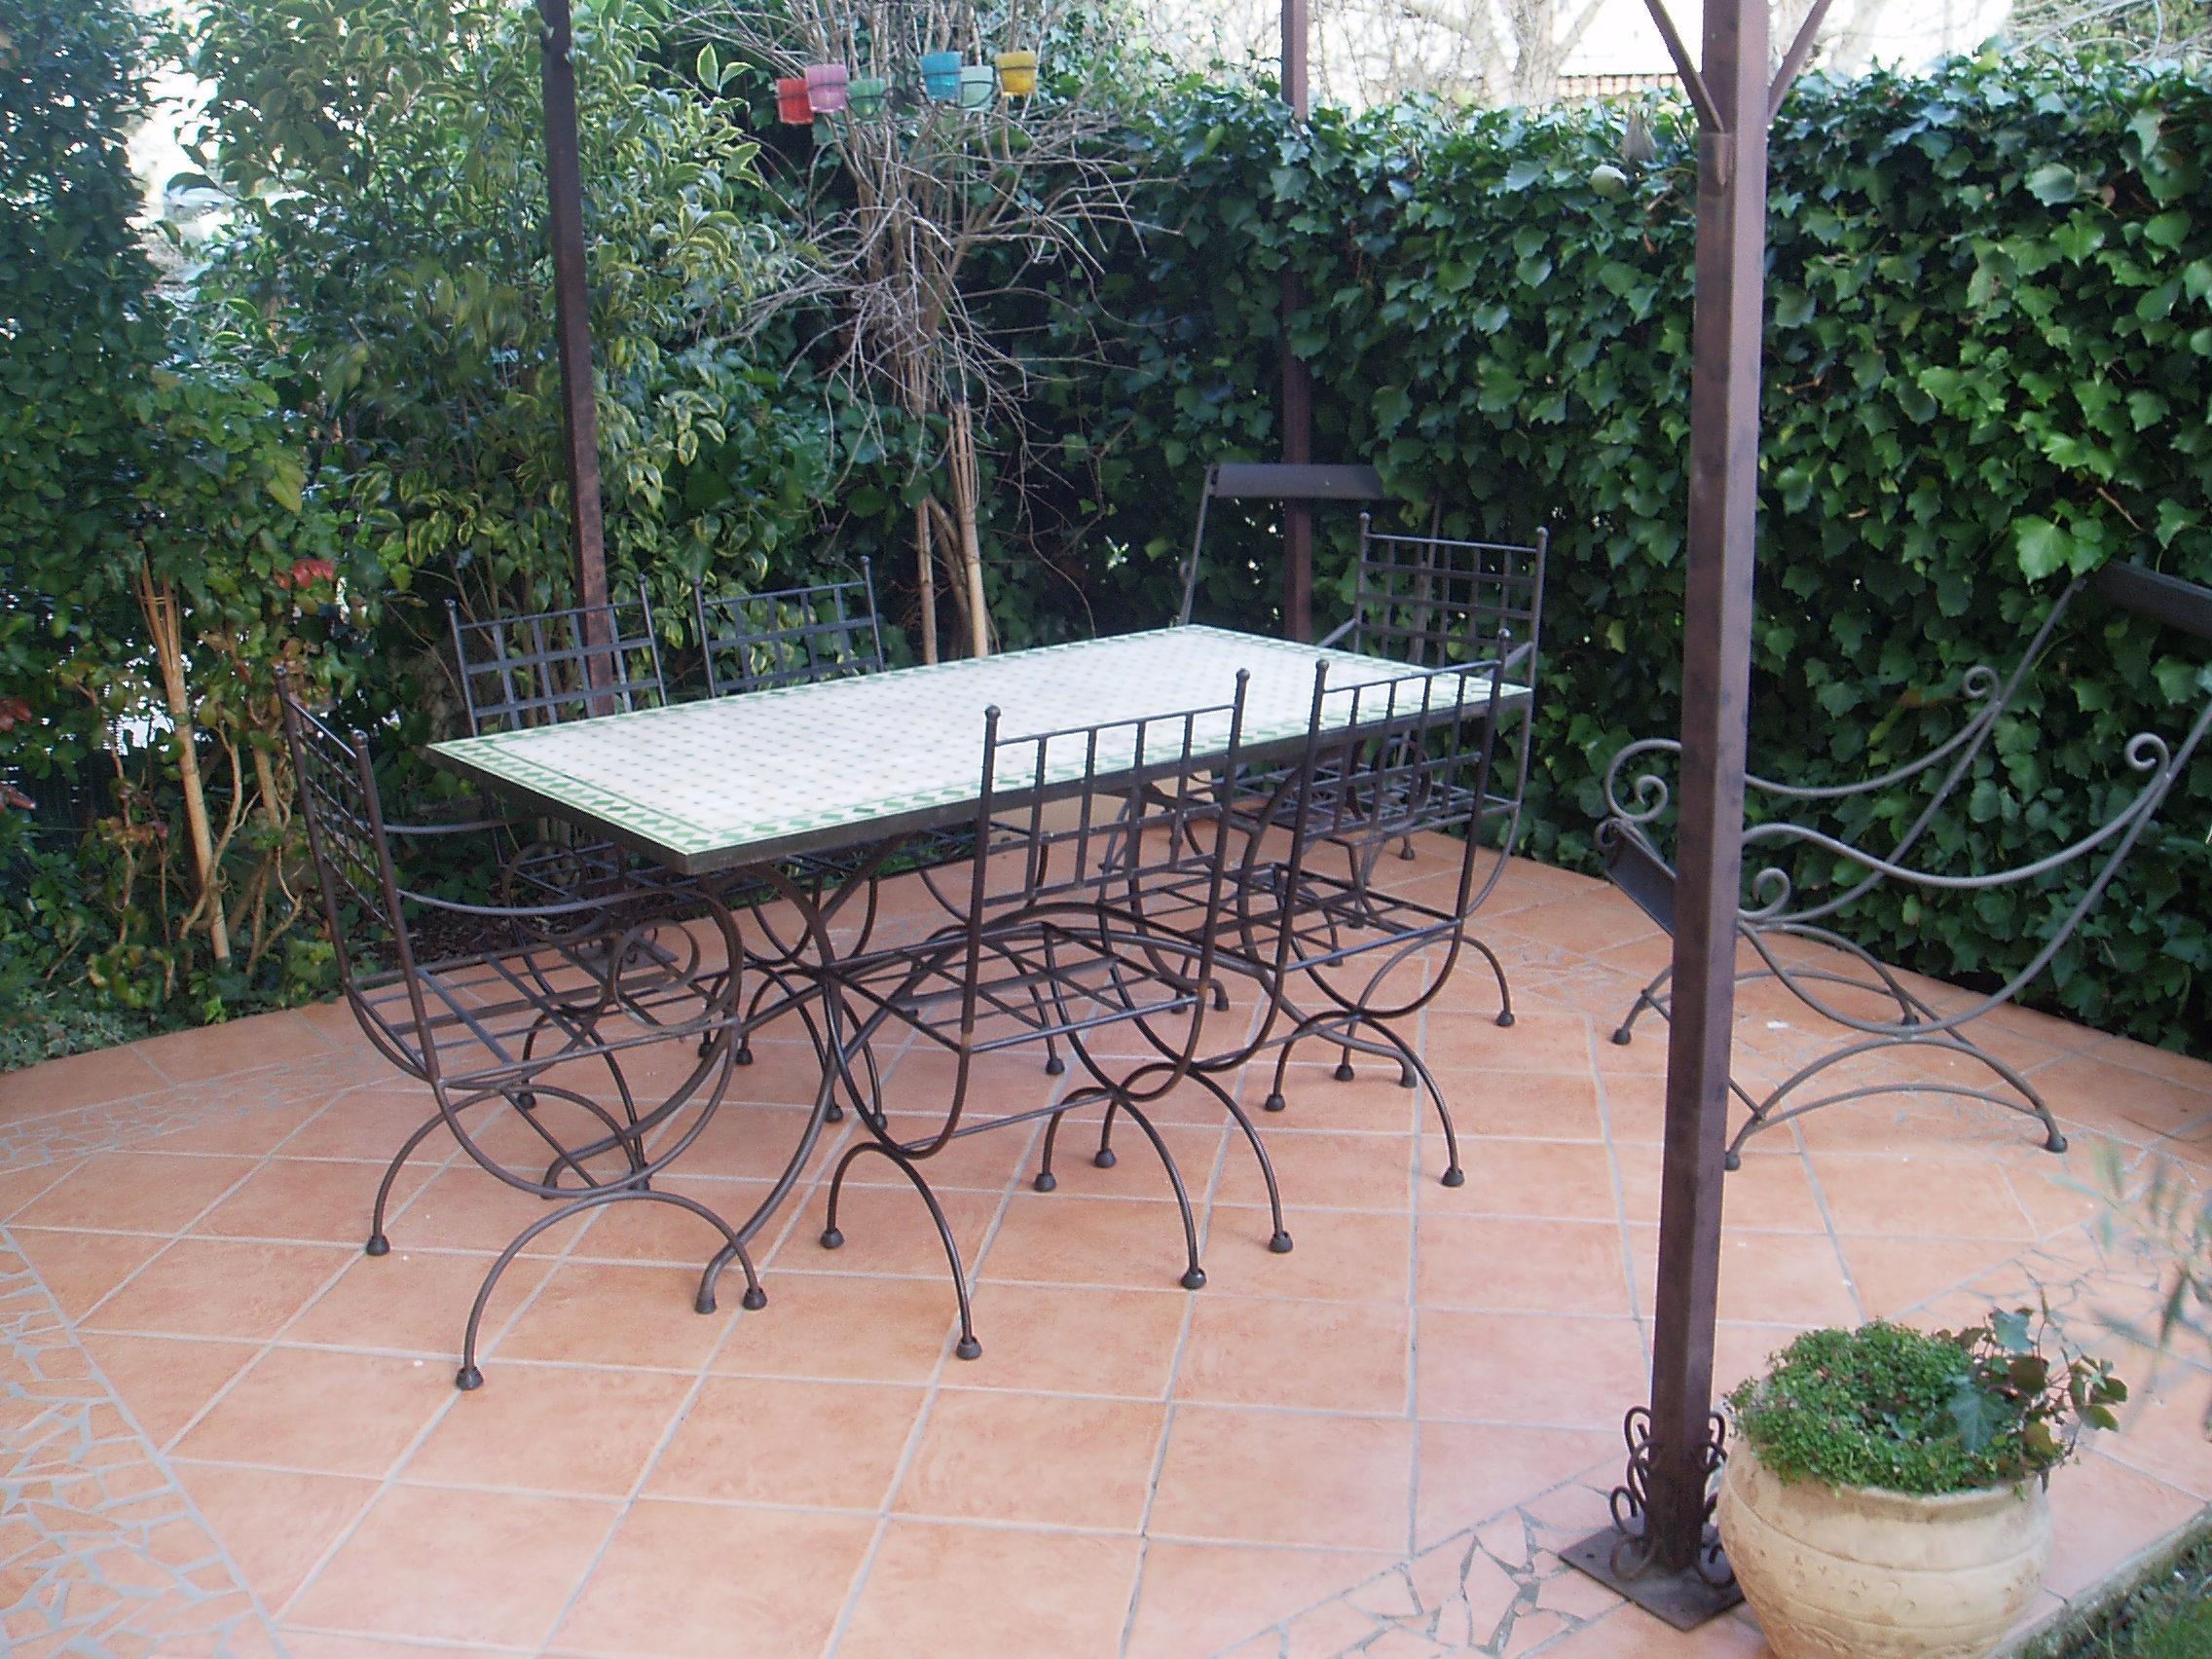 mosa que la terrasse mosa ques artisanales. Black Bedroom Furniture Sets. Home Design Ideas